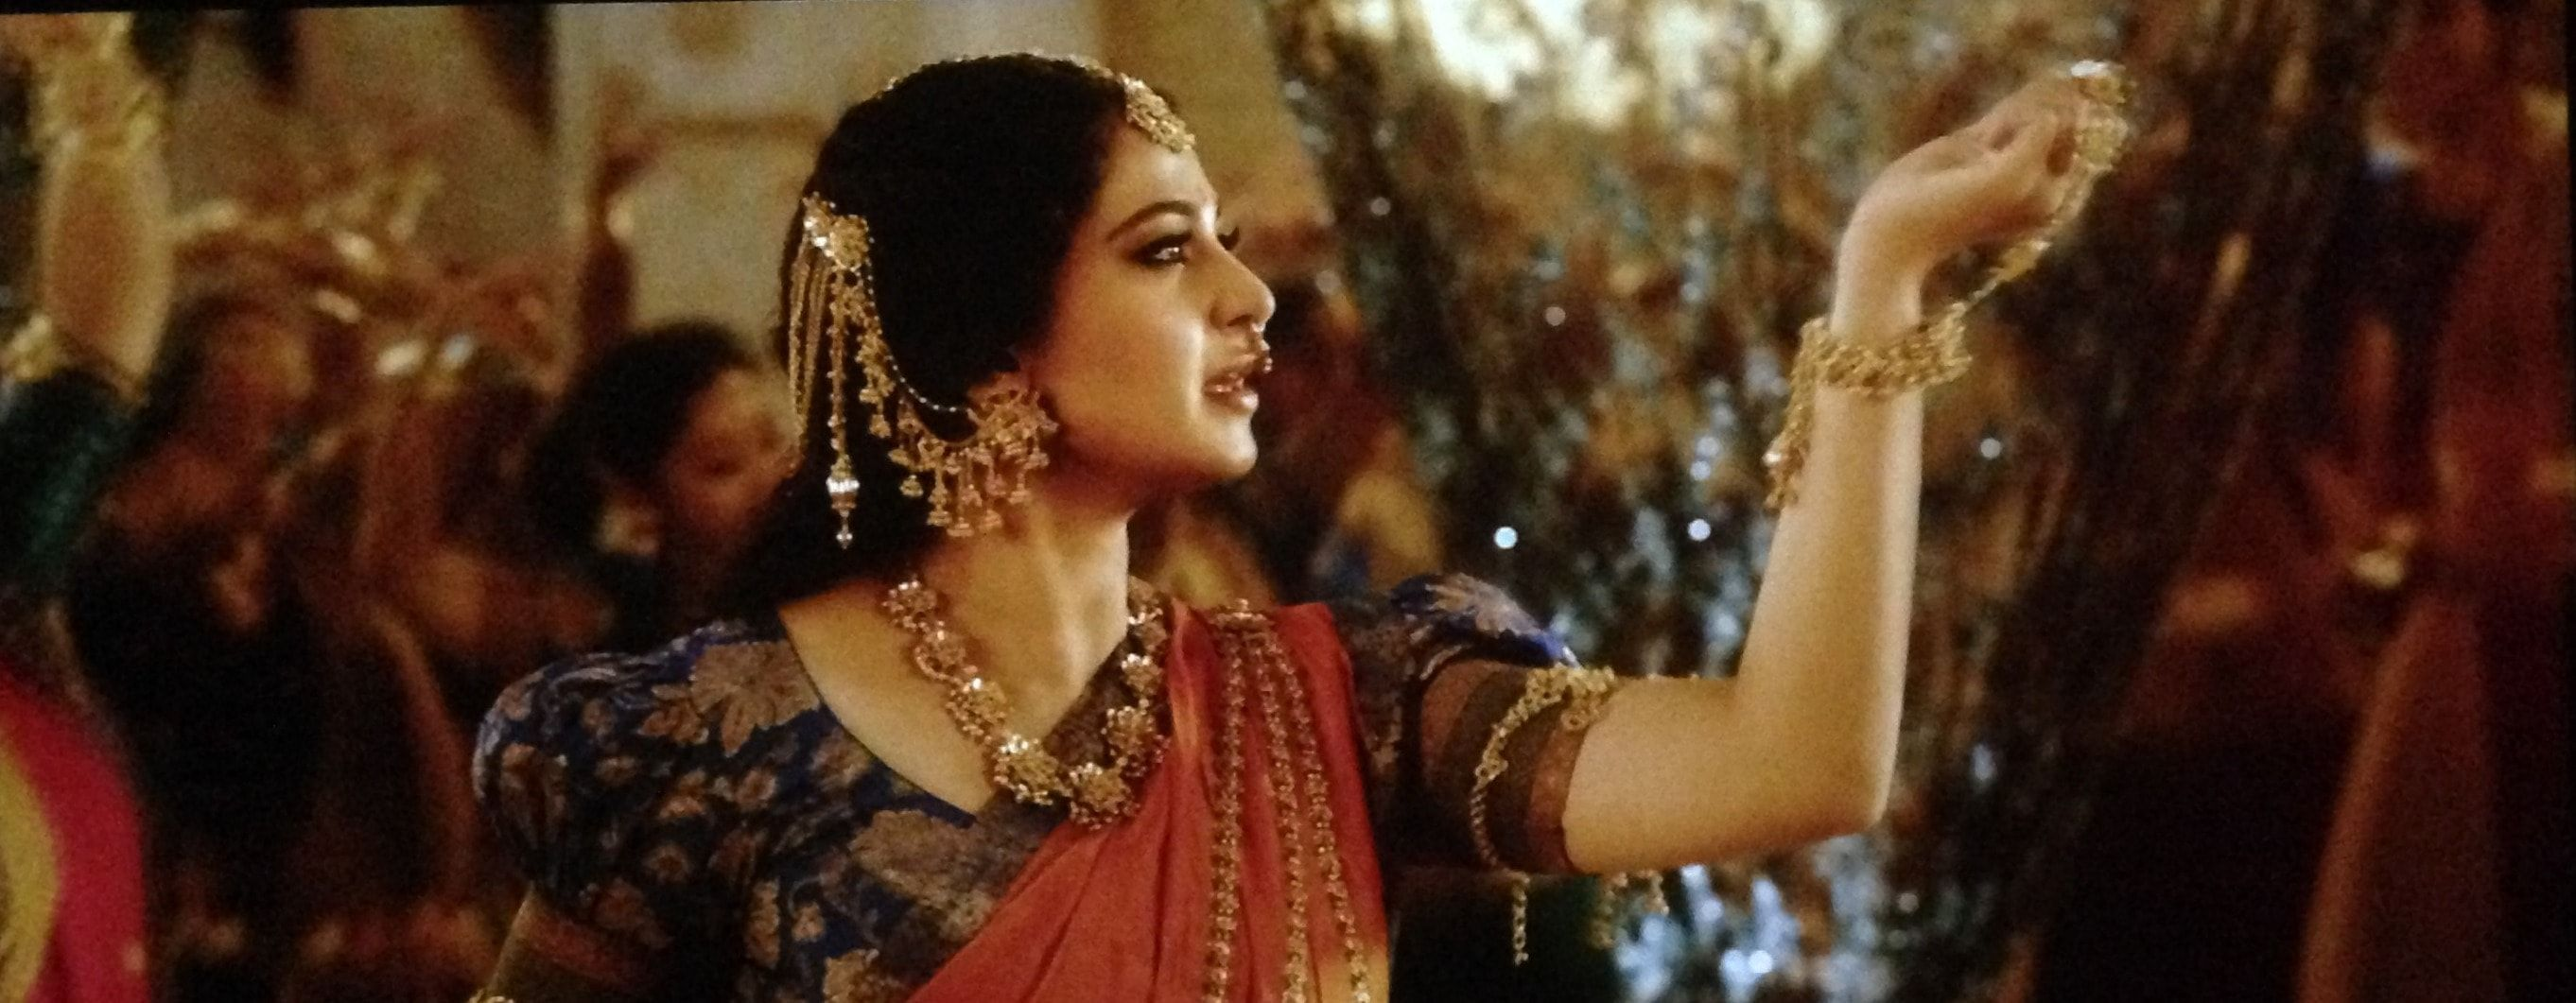 Anushka Shetty Goddess Looks Is Charismatic In Bahubali 2 -6152